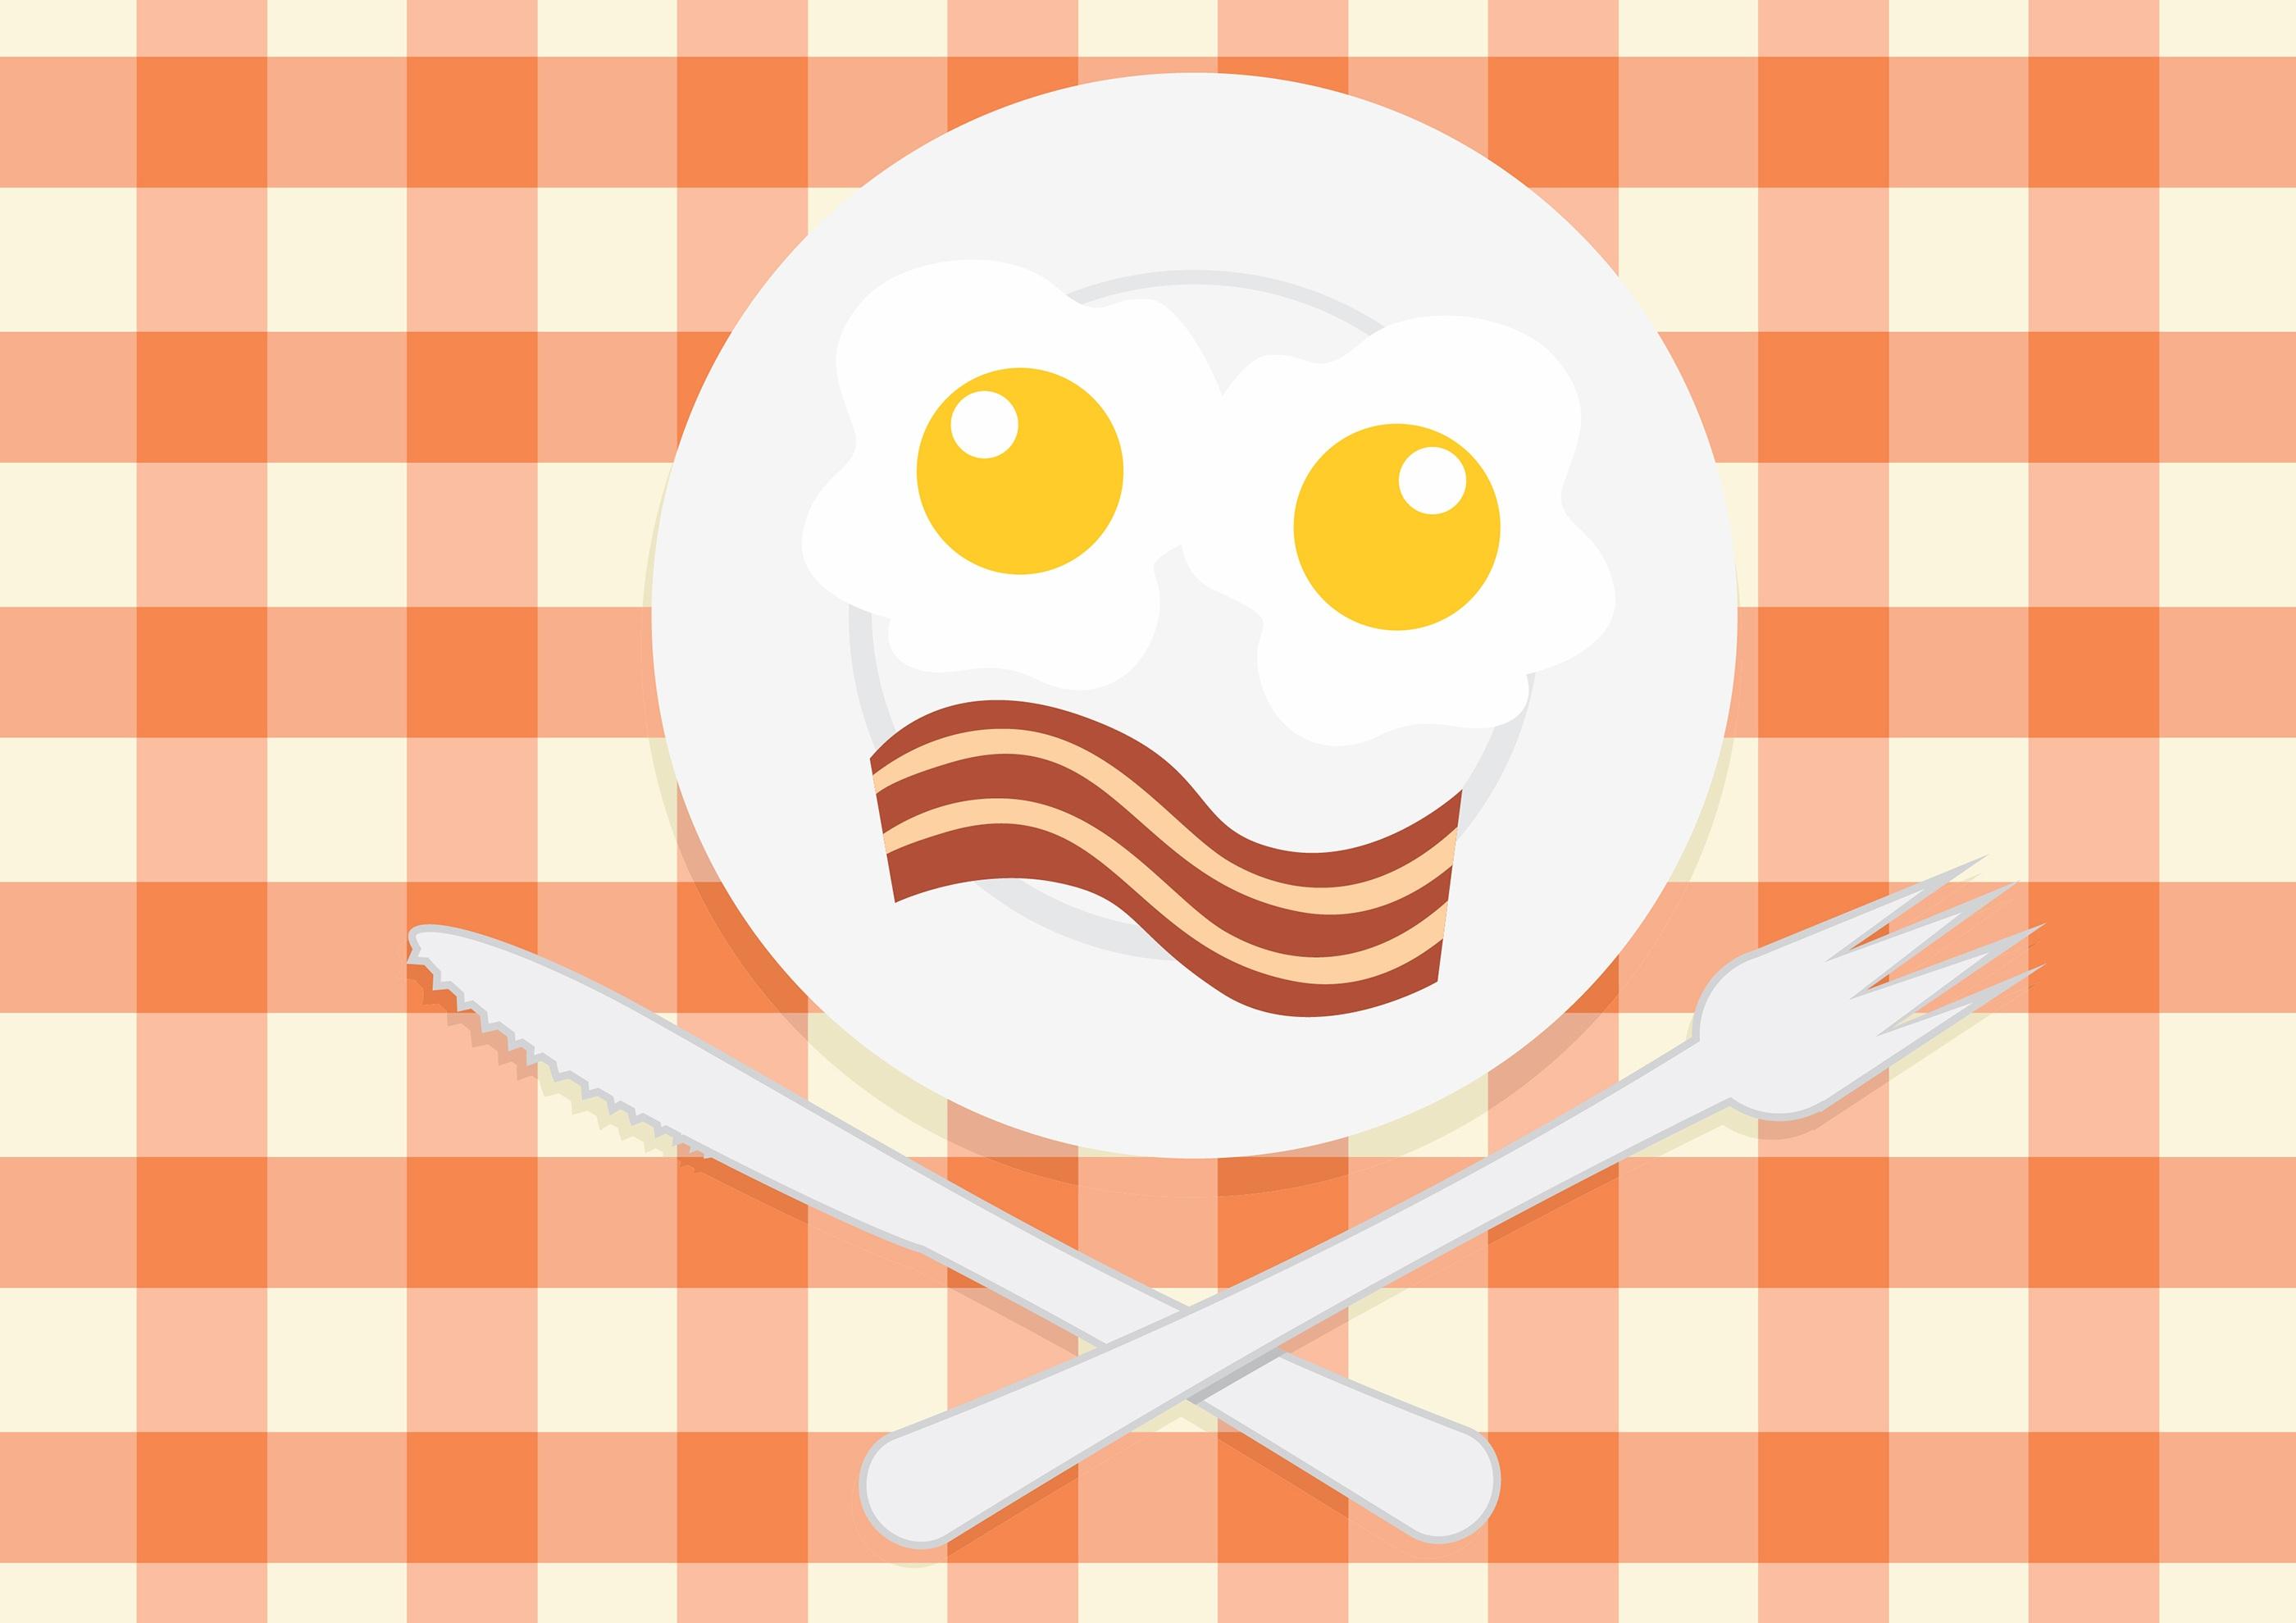 Gambar Garis Makanan Piring Makan Siang Fon Ilustrasi Icon